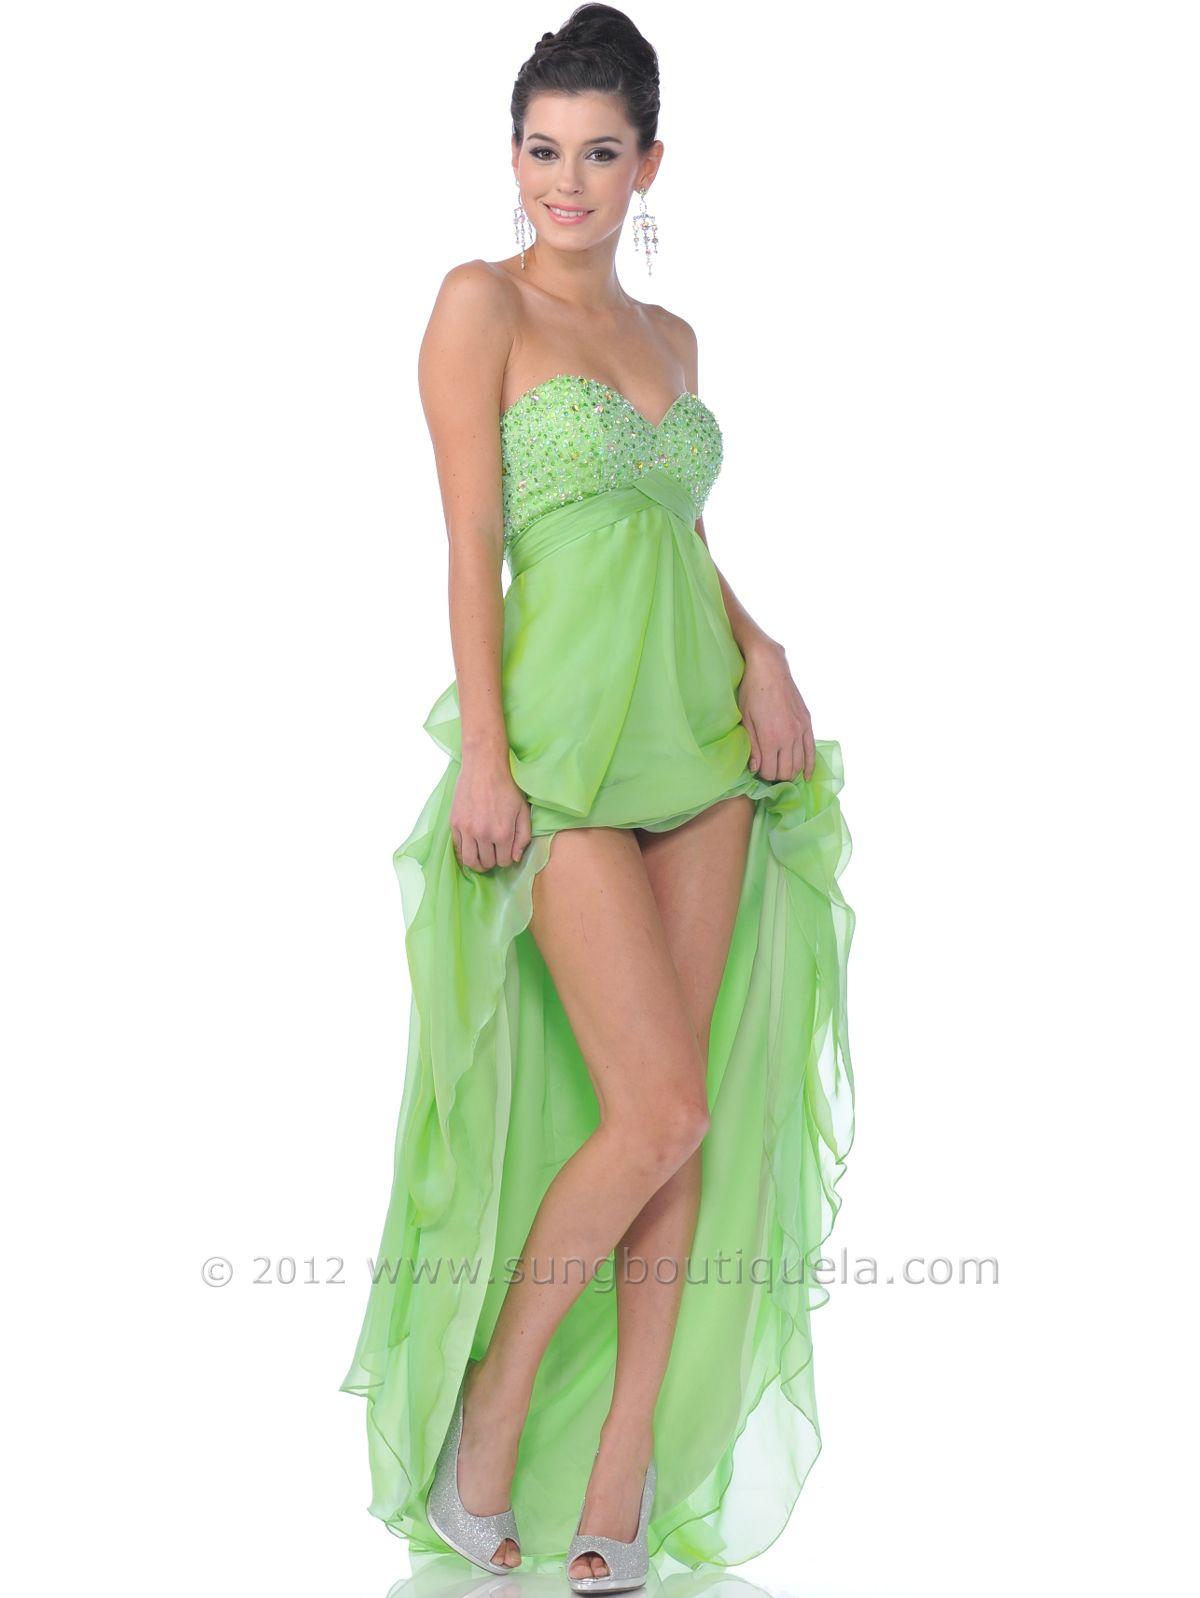 Green strapless chiffon high low prom dress get yours today at green strapless chiffon high low prom dress get yours today at sungboutiquela ombrellifo Choice Image